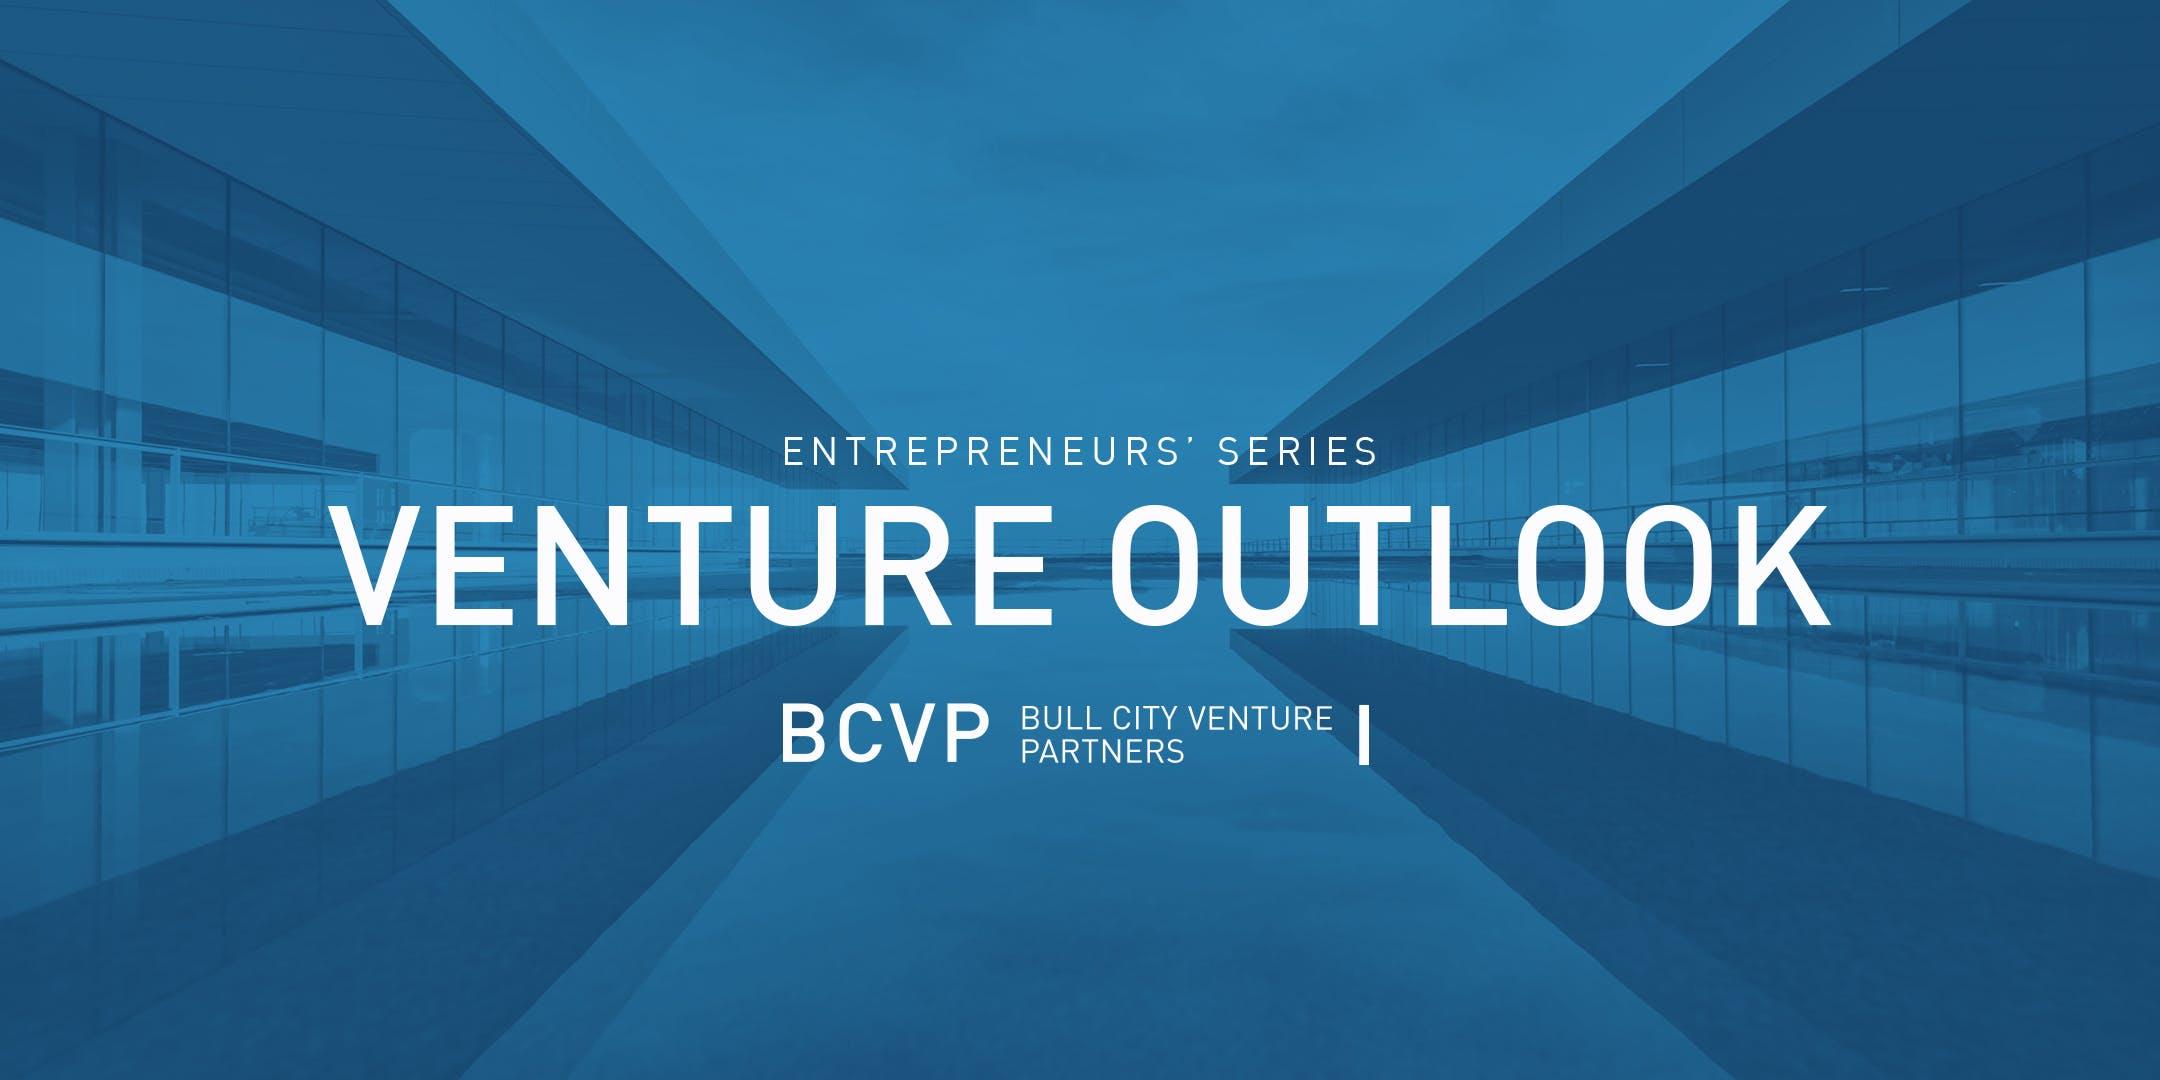 BCVP Entrepreneurs Series Venture Outlook 2019